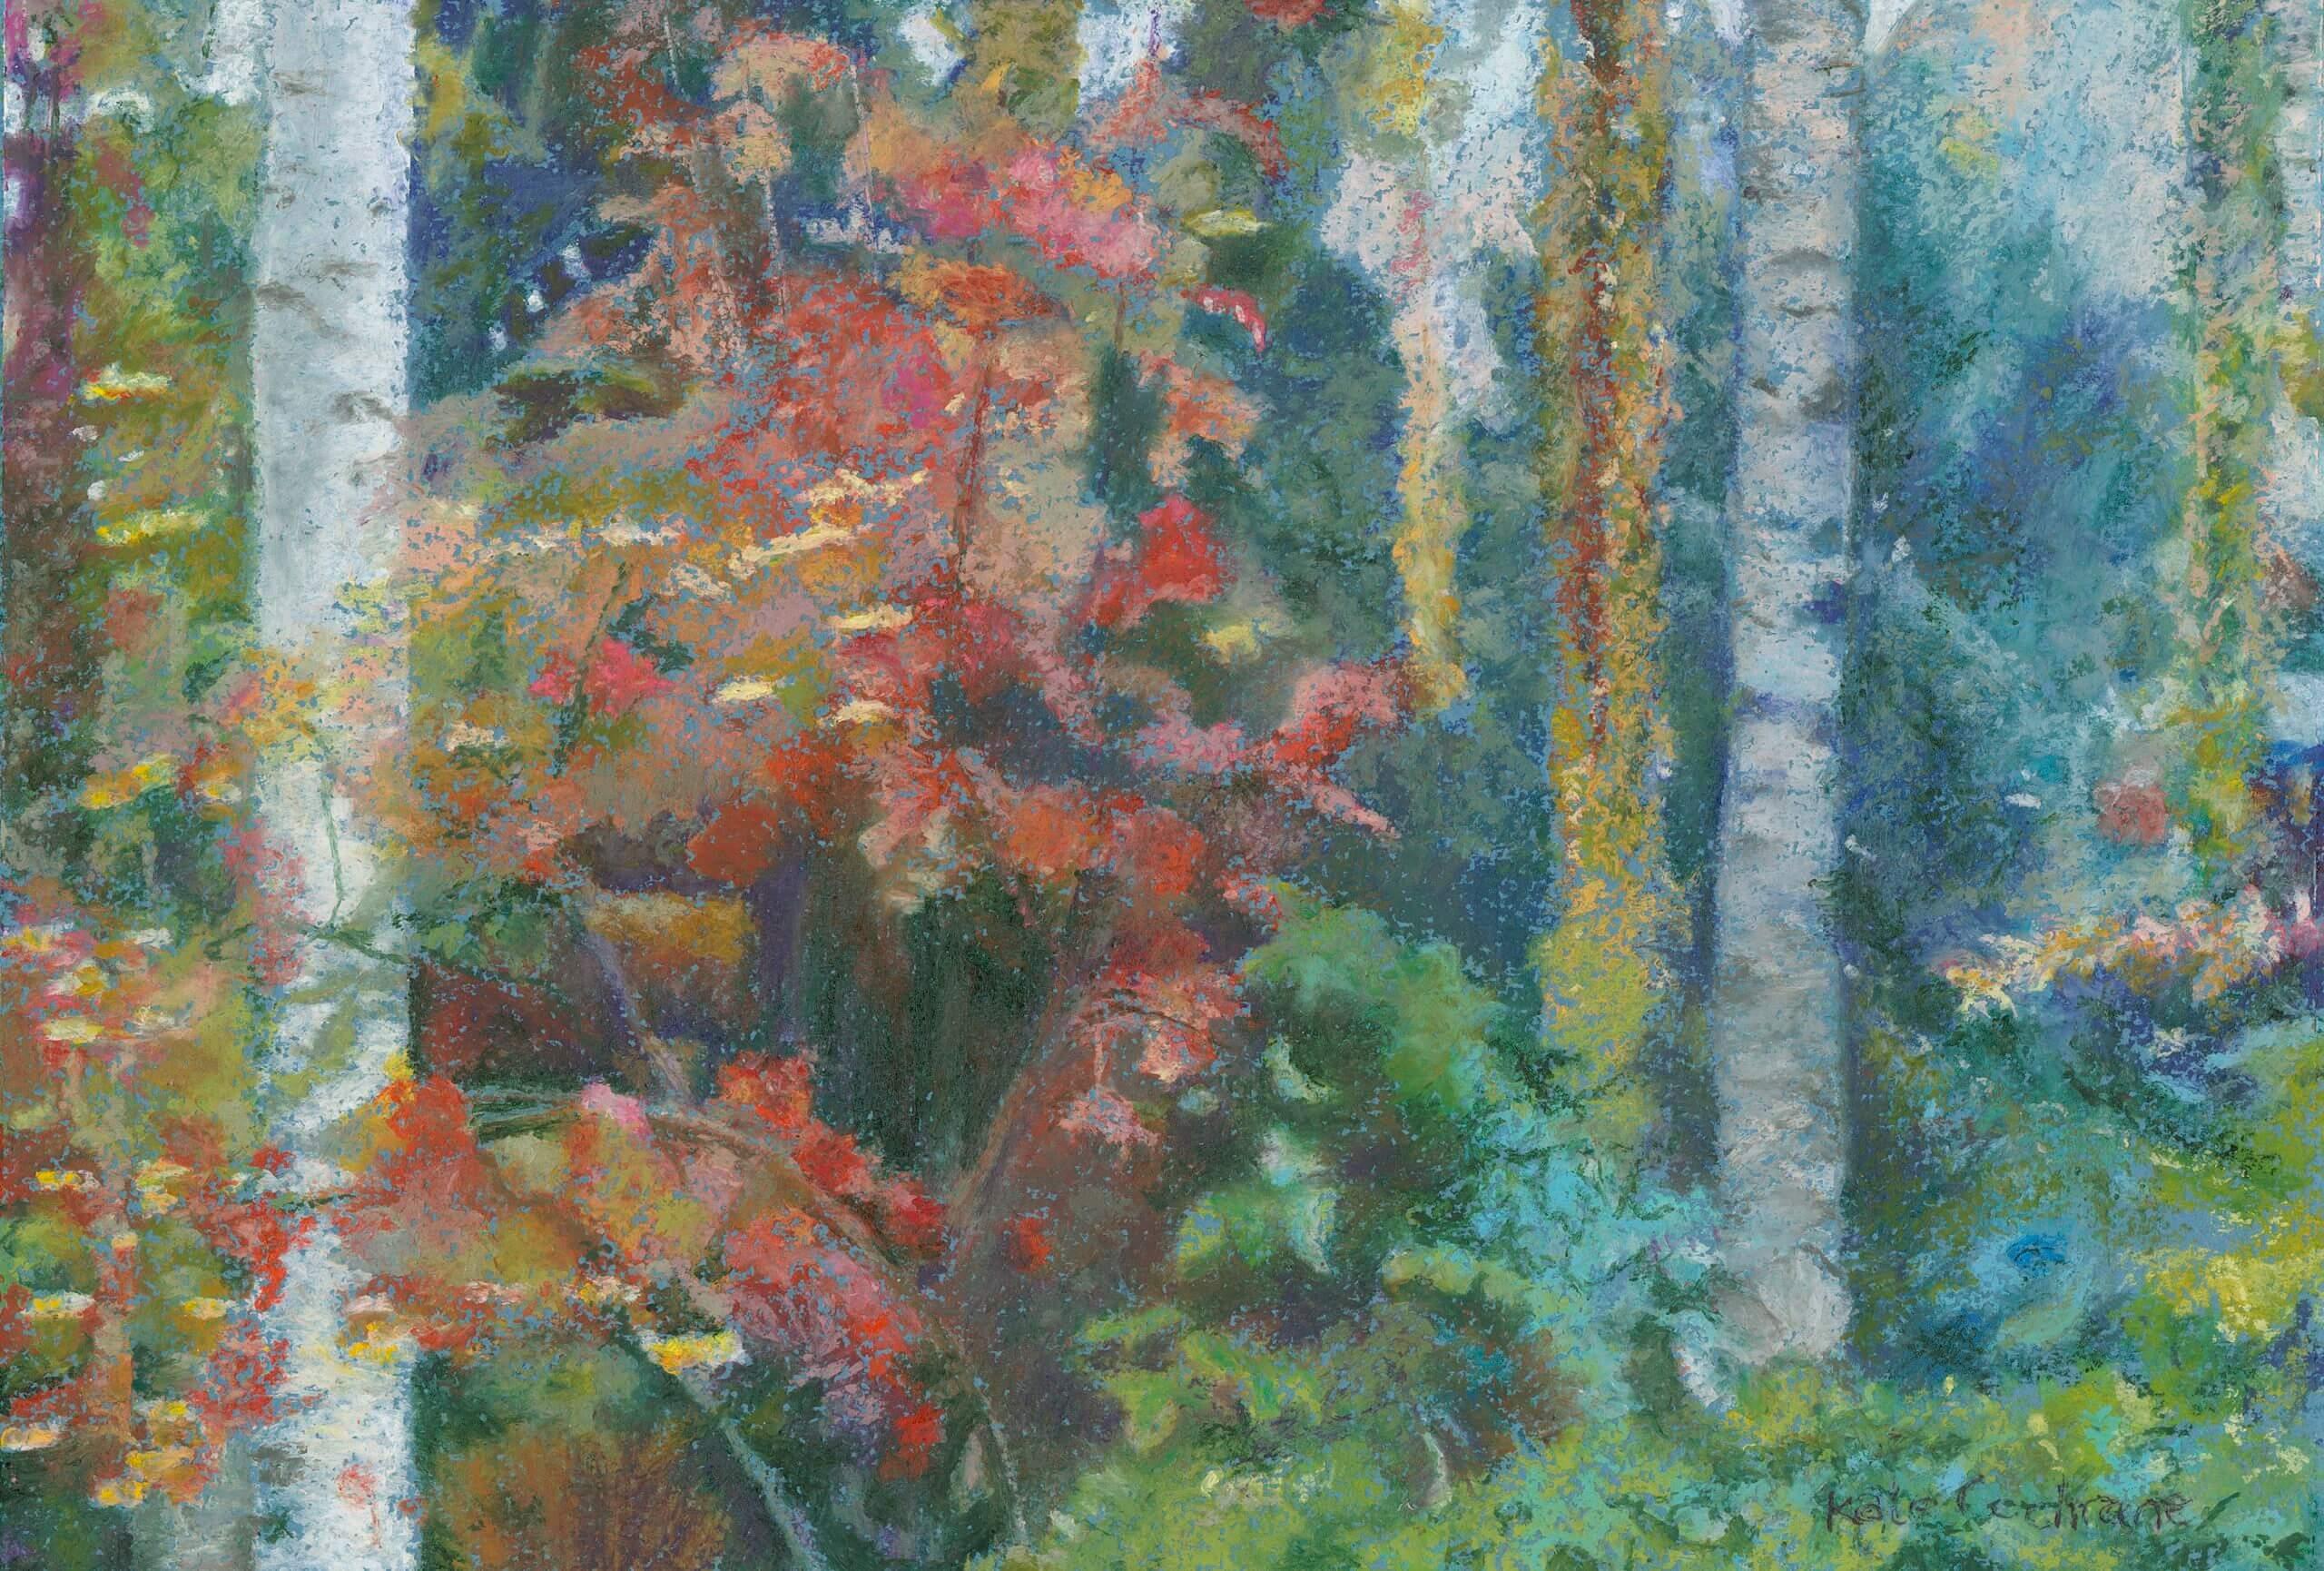 'The Woodland Garden Next Door', Keyford, Frome